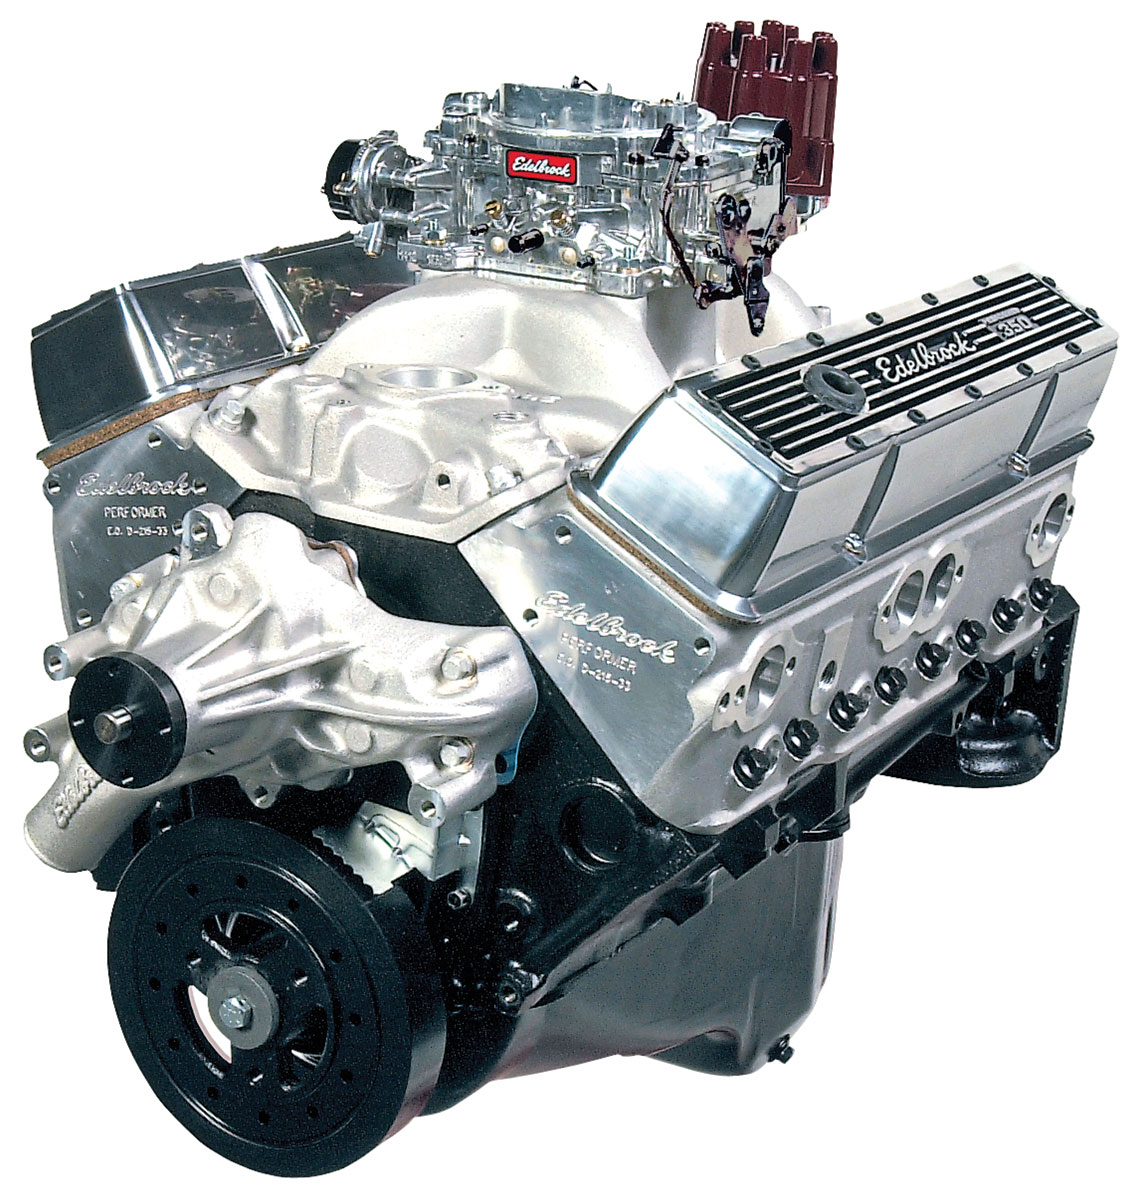 Photo of El Camino Crate Engine, Edelbrock Performer Performer Eps Manifold & 650 Cfm Thunder Series Avs Carburetor long water pump, satin